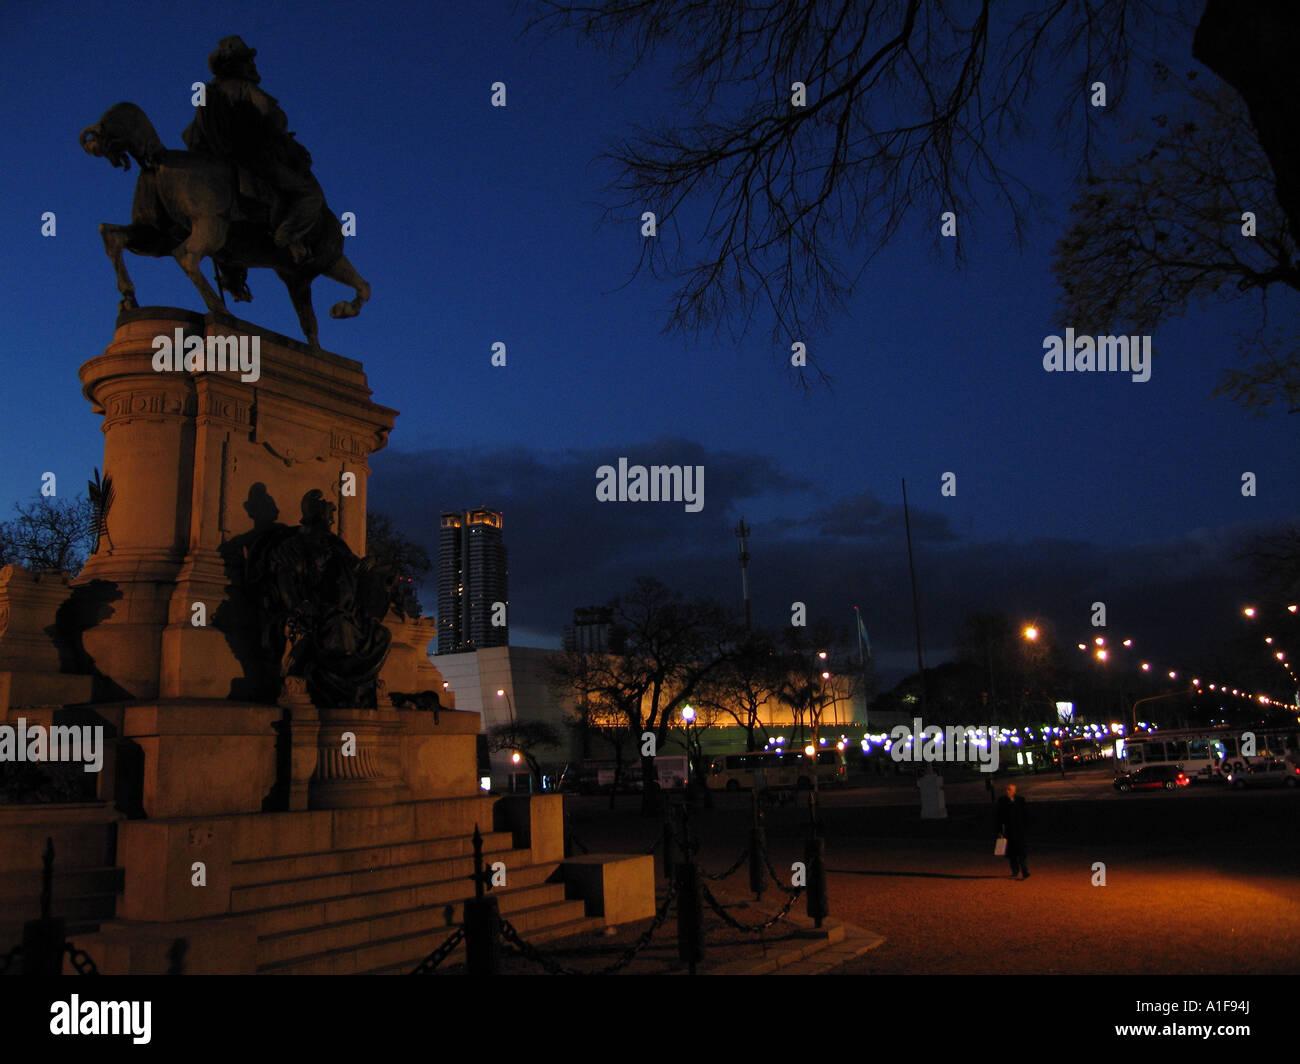 at dusk - Stock Image